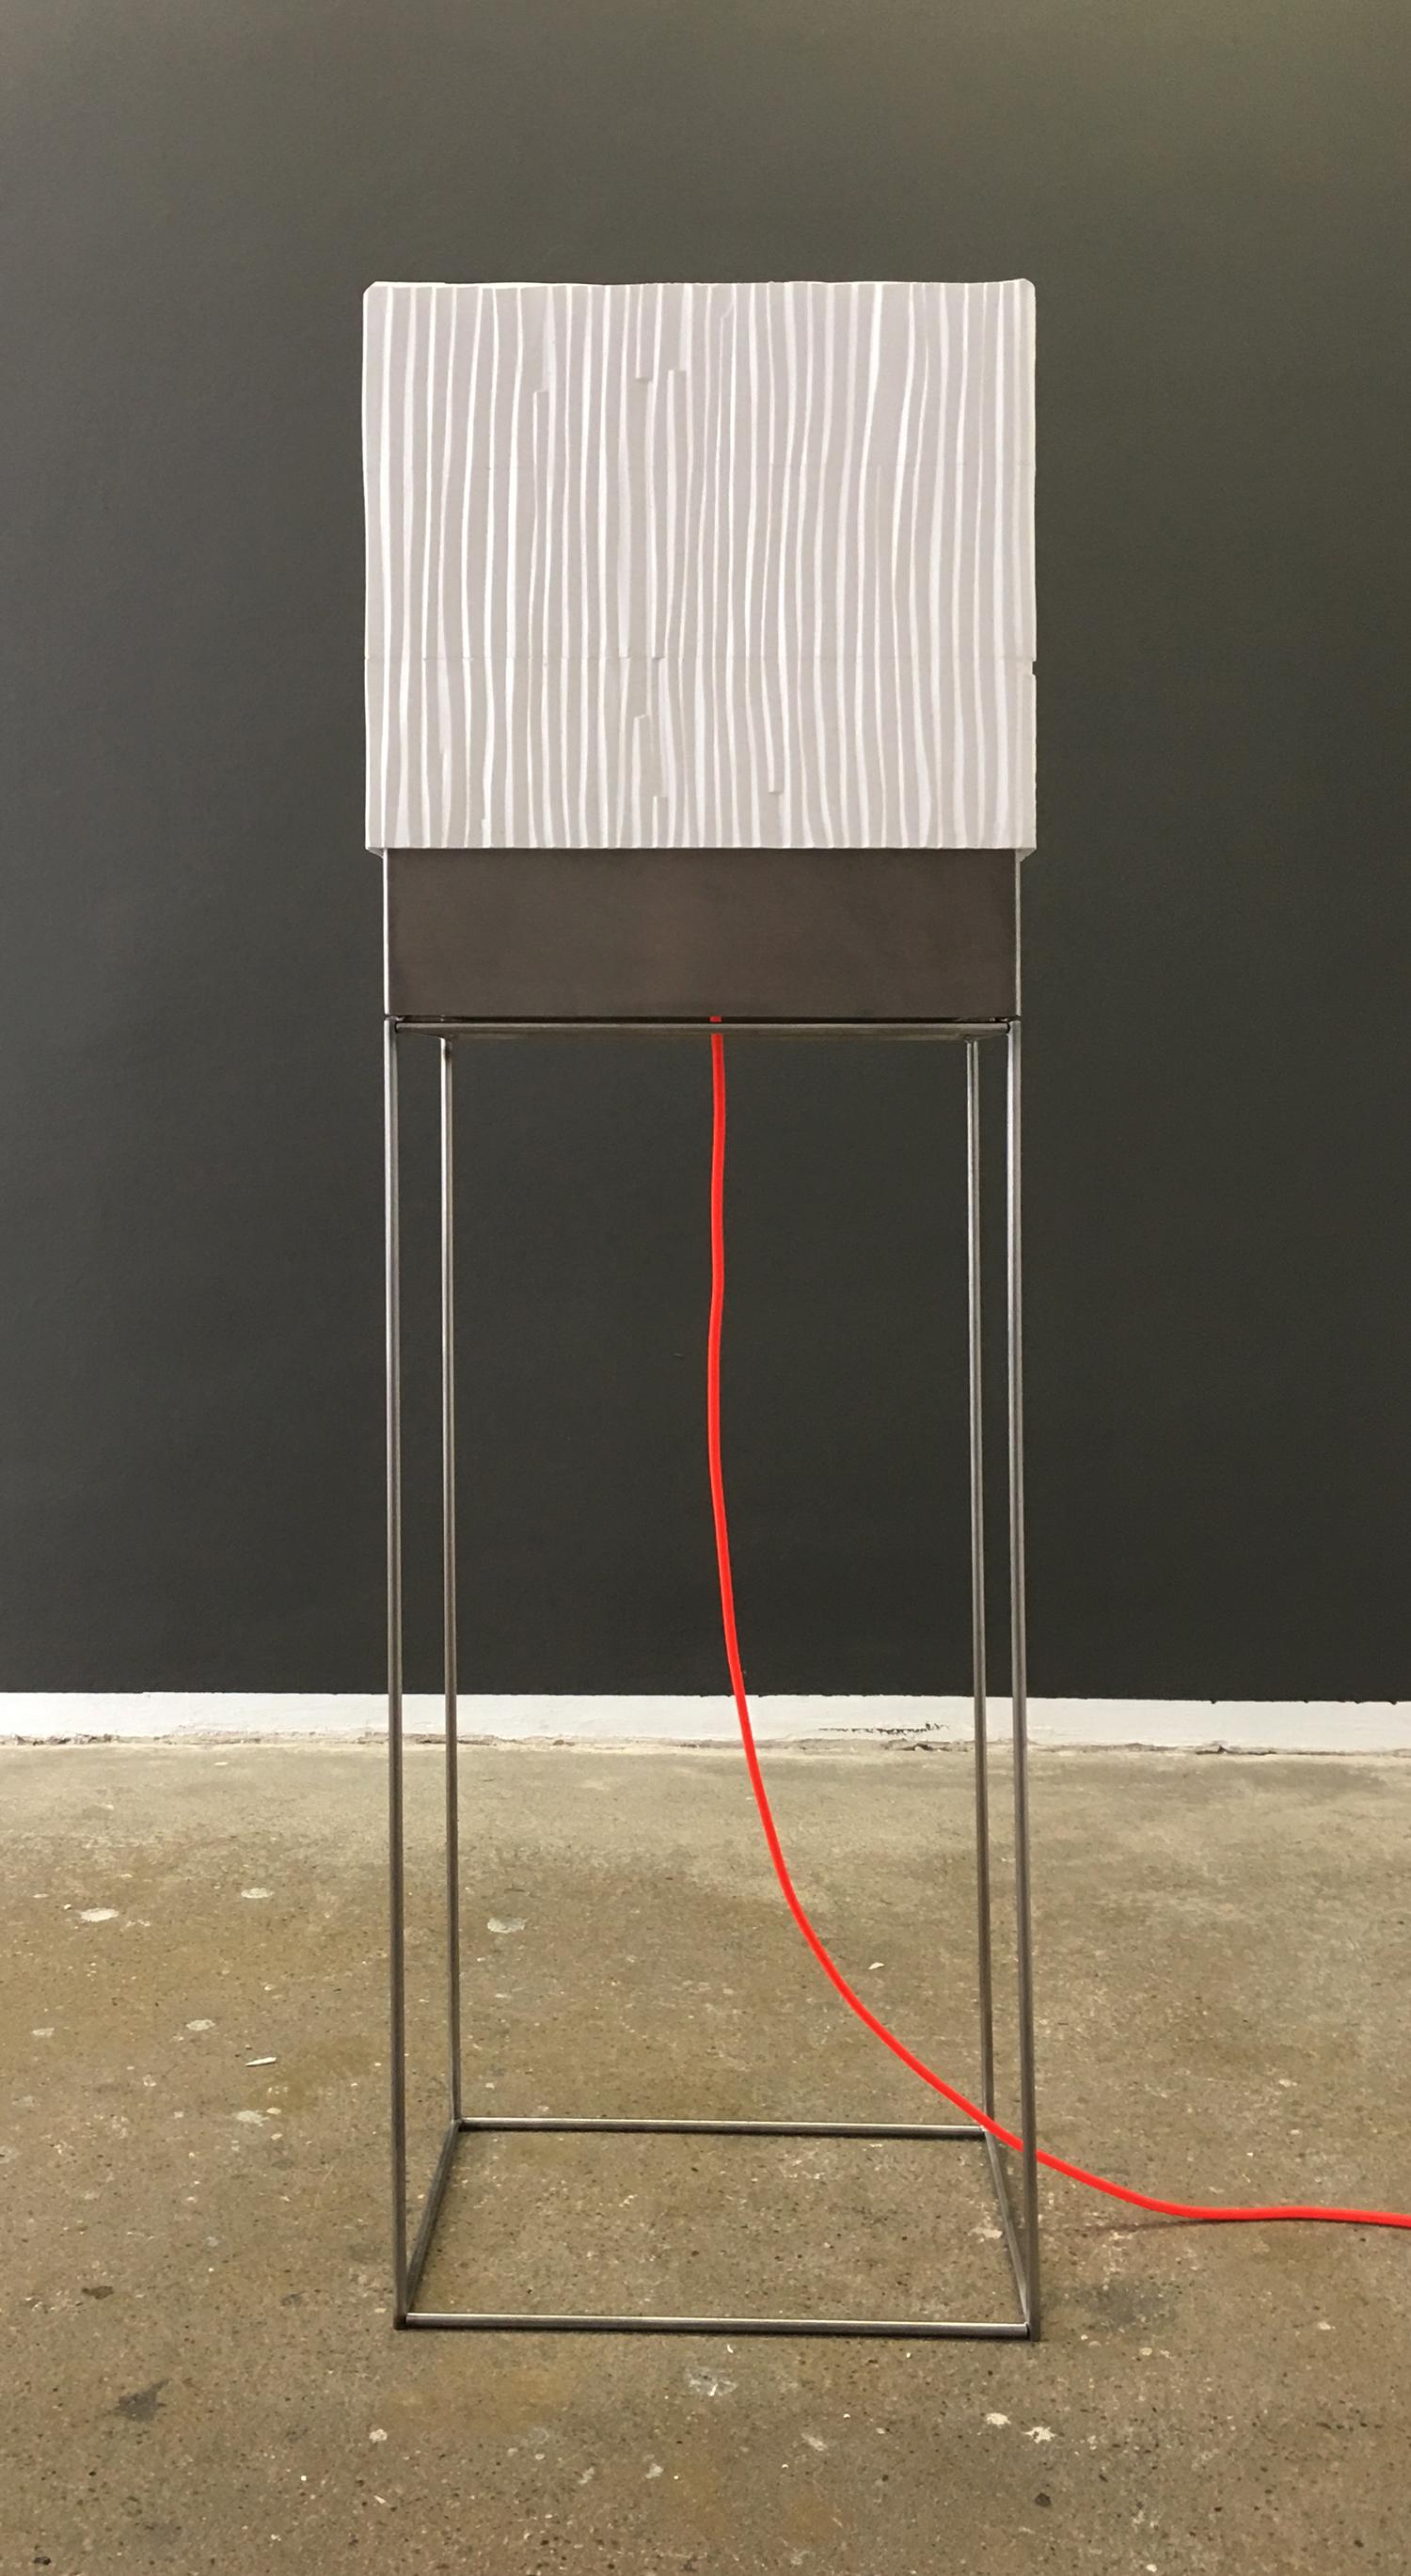 floorlamp-vertical-horizontal-gislela-stiegler-marion-friedmann-gallery-frontal-view-vertical-unlit.jpg